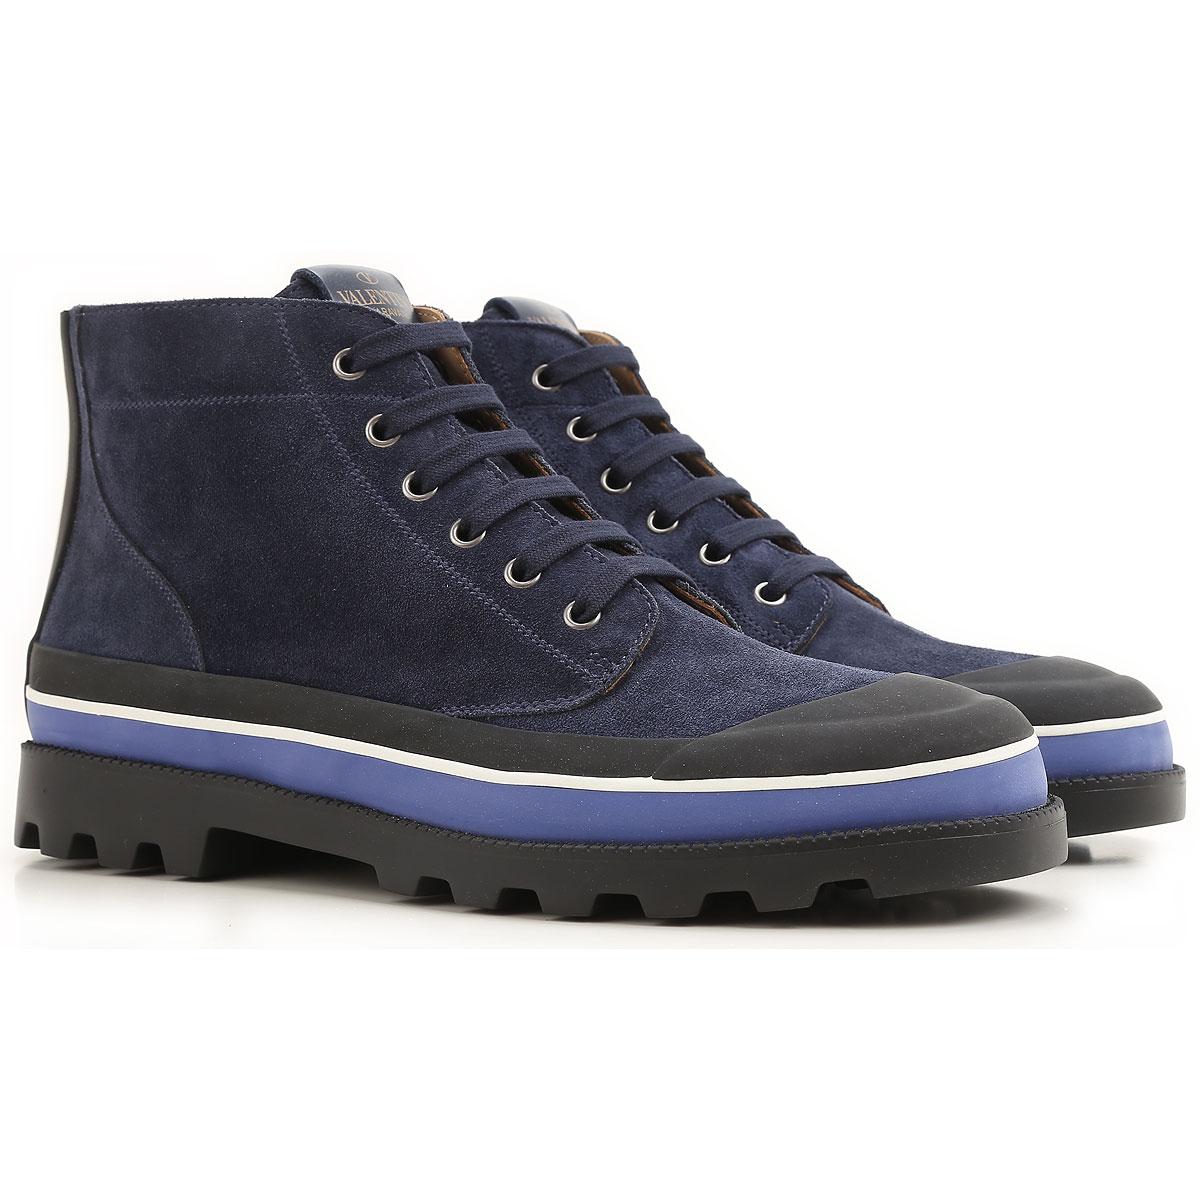 Mens Shoes Valentino Garavani. Style code: ny2s0966-uvs-m30